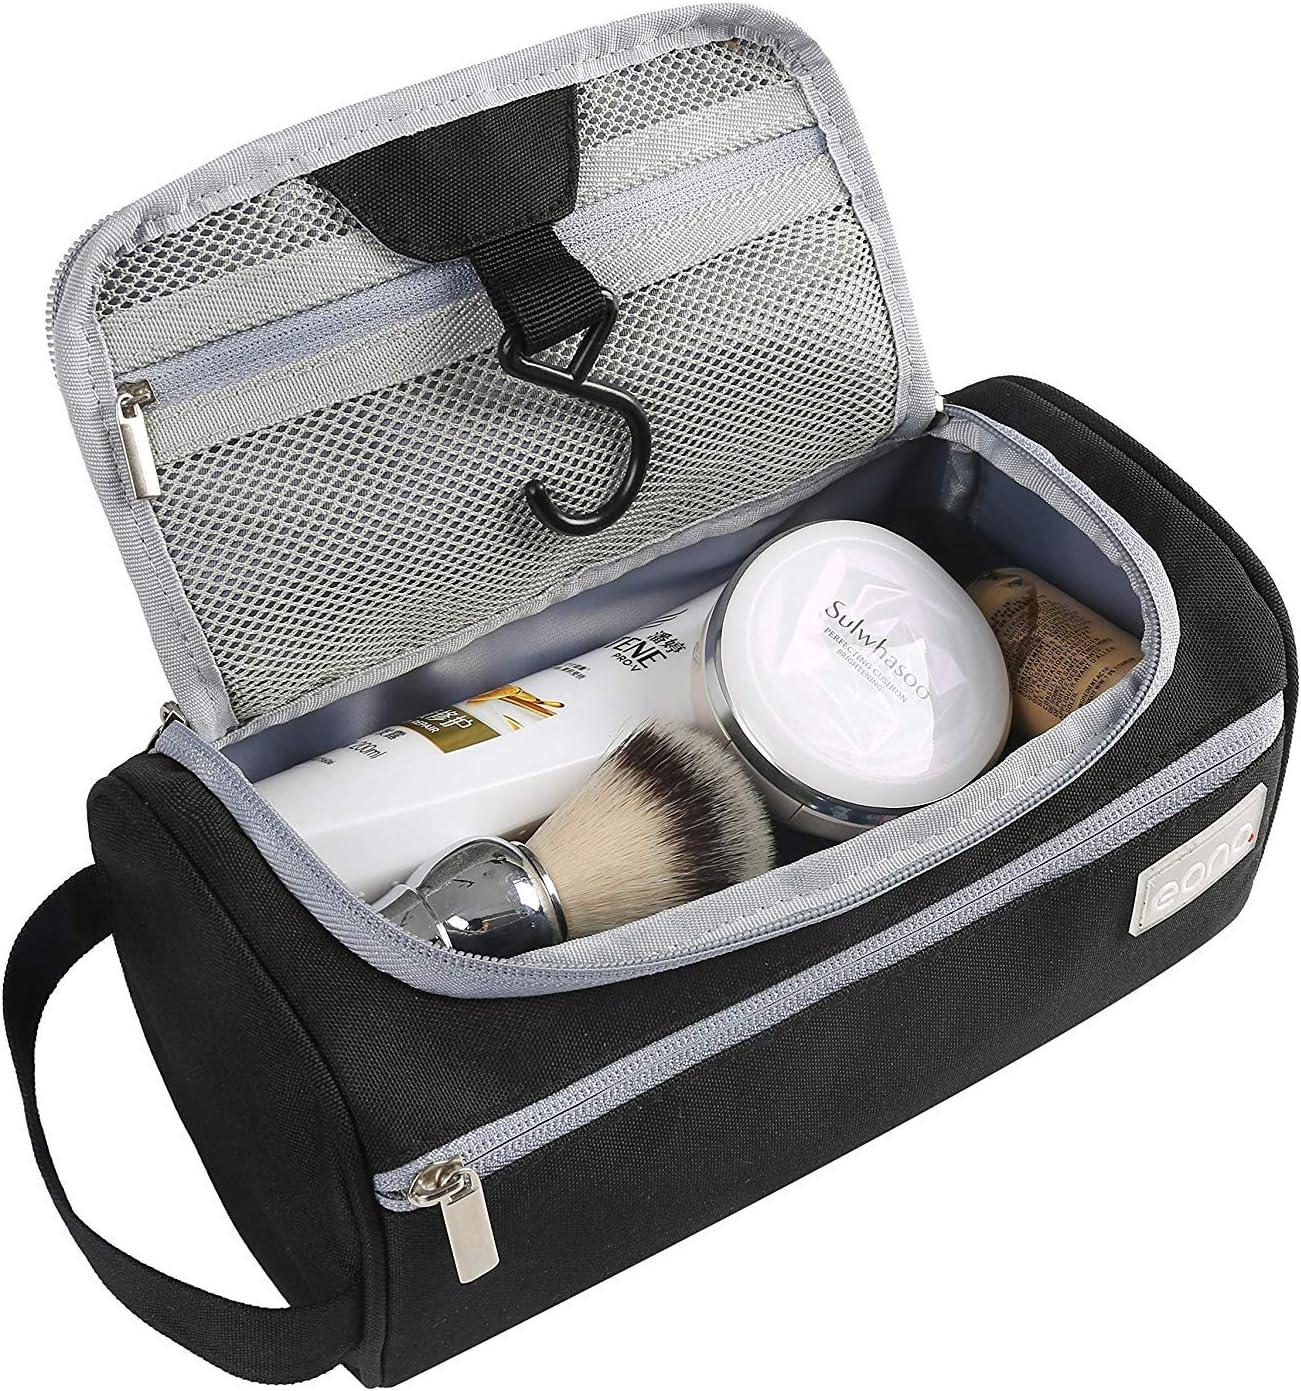 Eono by Amazon - Bolsas de Aseo Neceser Avion Unisexo Neceseres de Viaje Toiletry Bag Neceser Maquillaje con Gancho para Colgar Bolsa de Cosmético Impermeable Organizador de Viaje, Negro